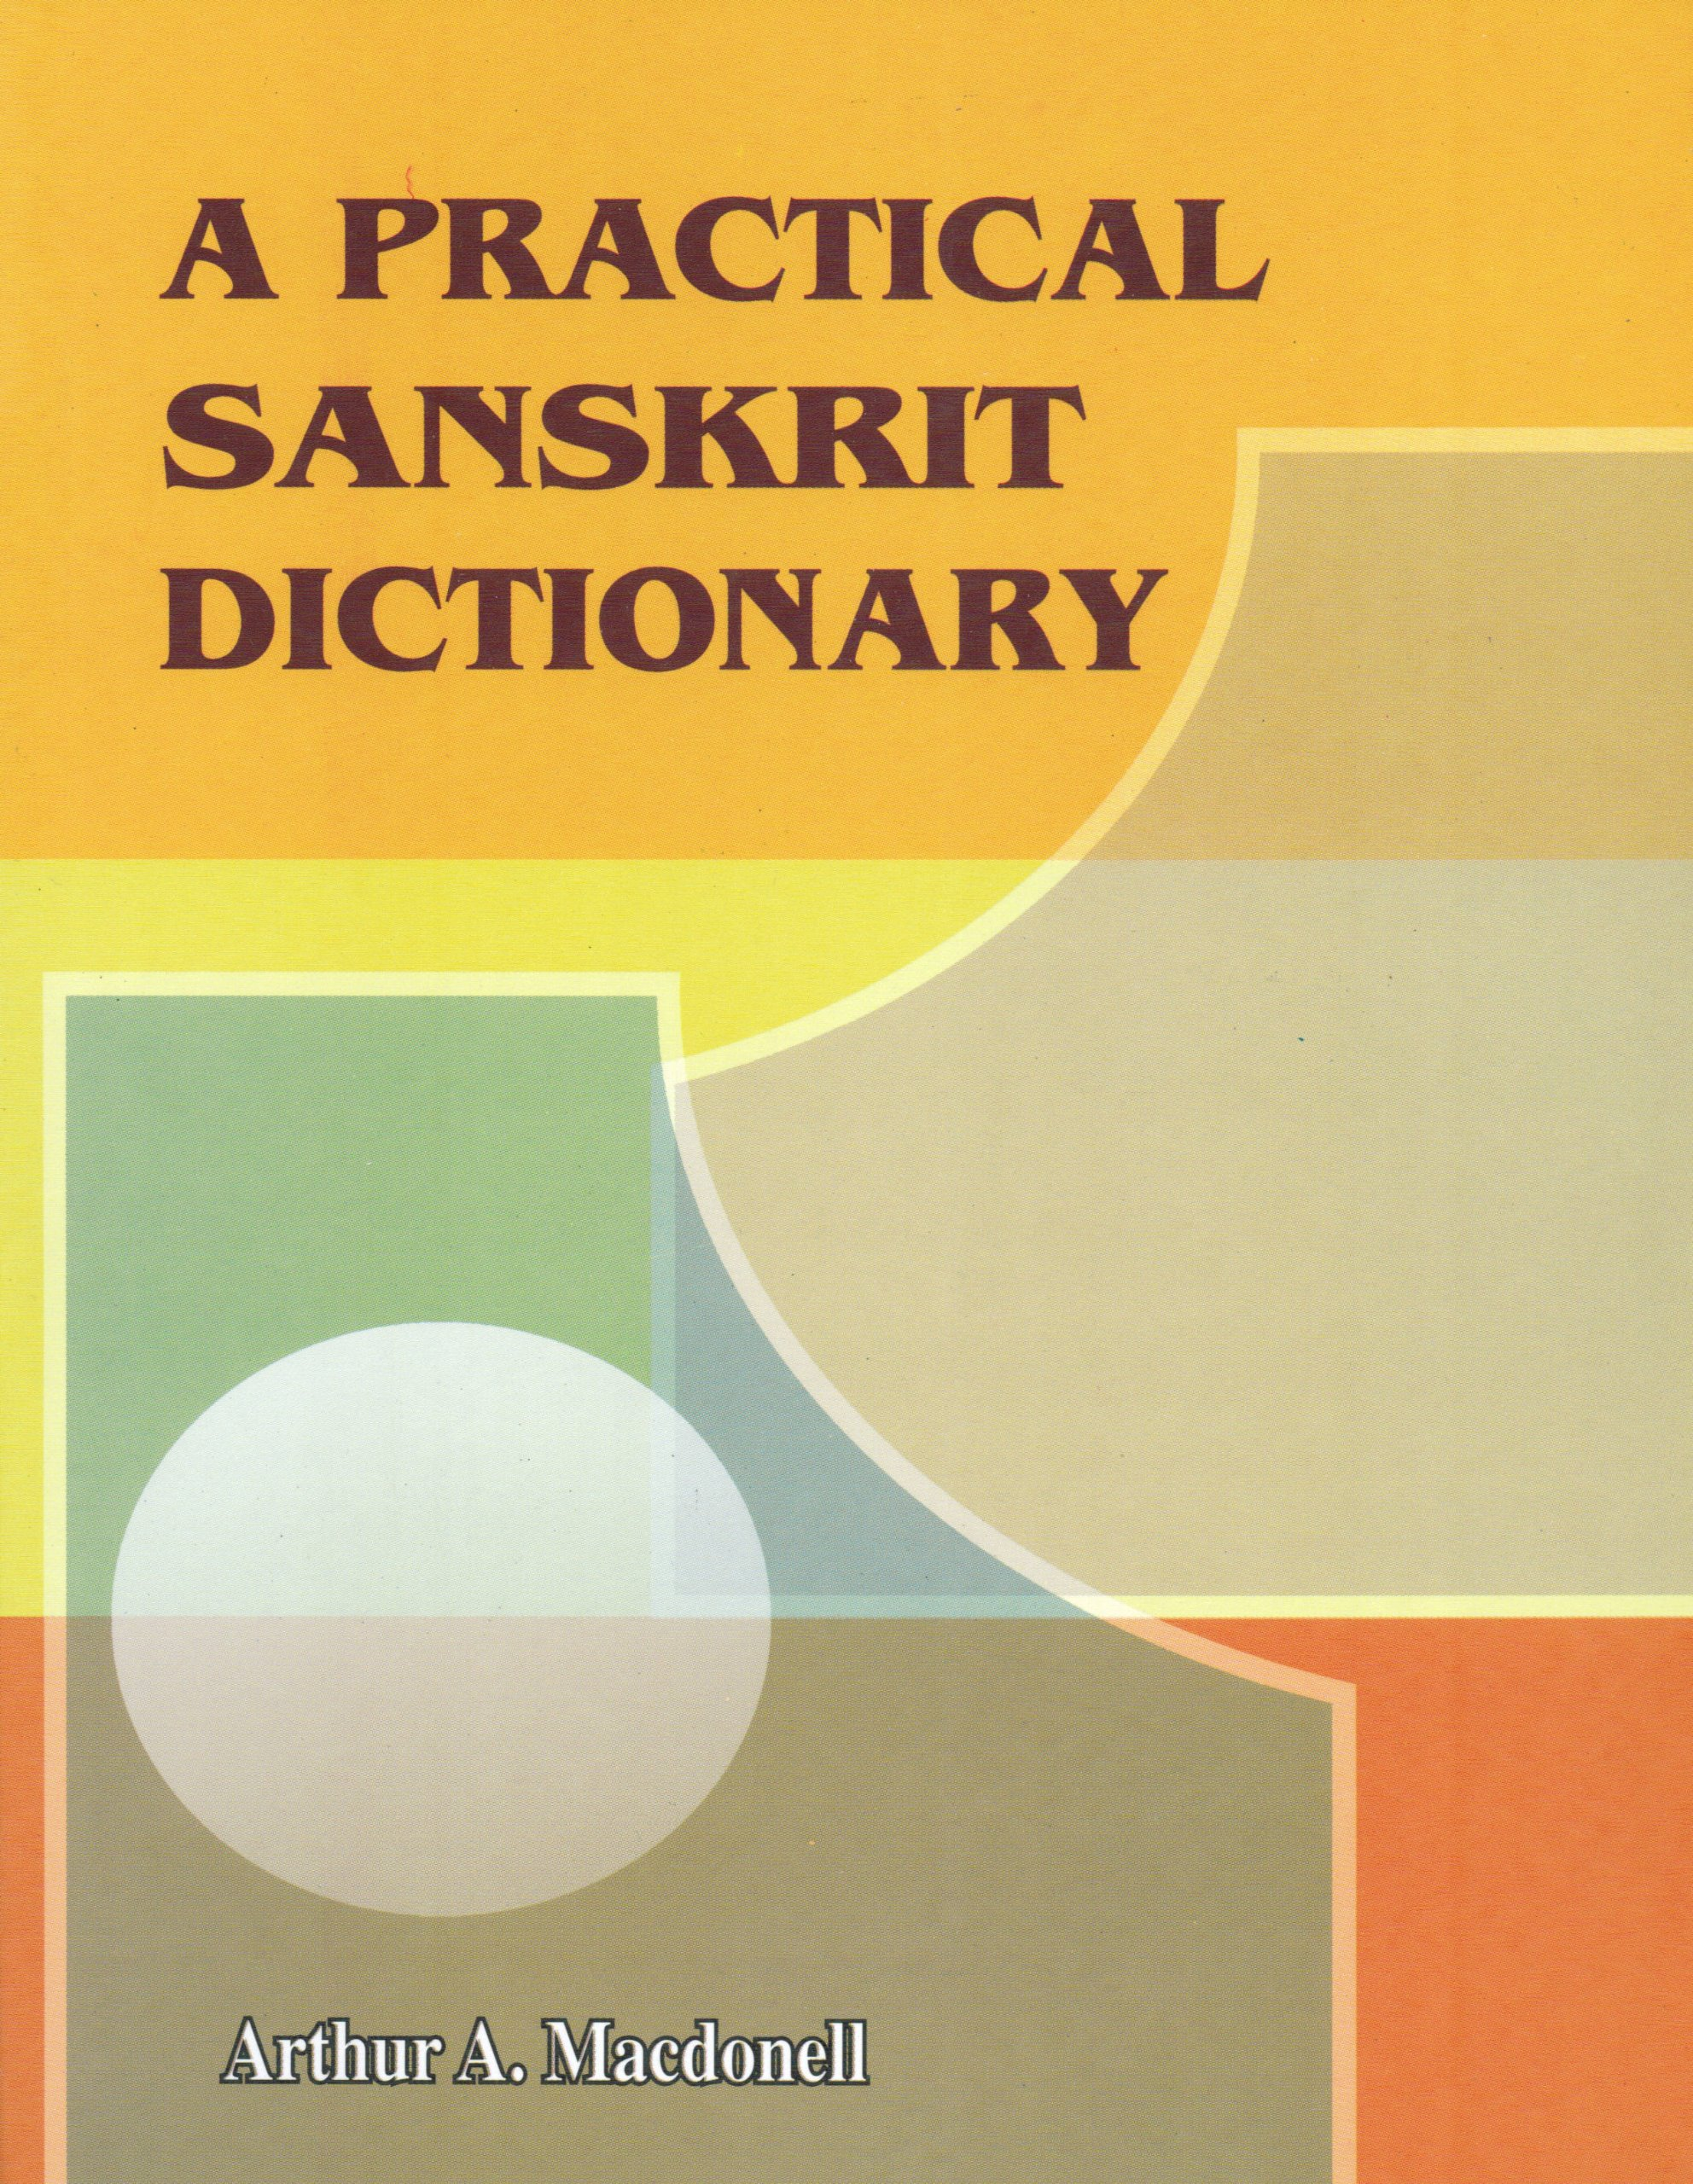 A Practical Sanskrit Dictionary: Arthur A  Macdonell